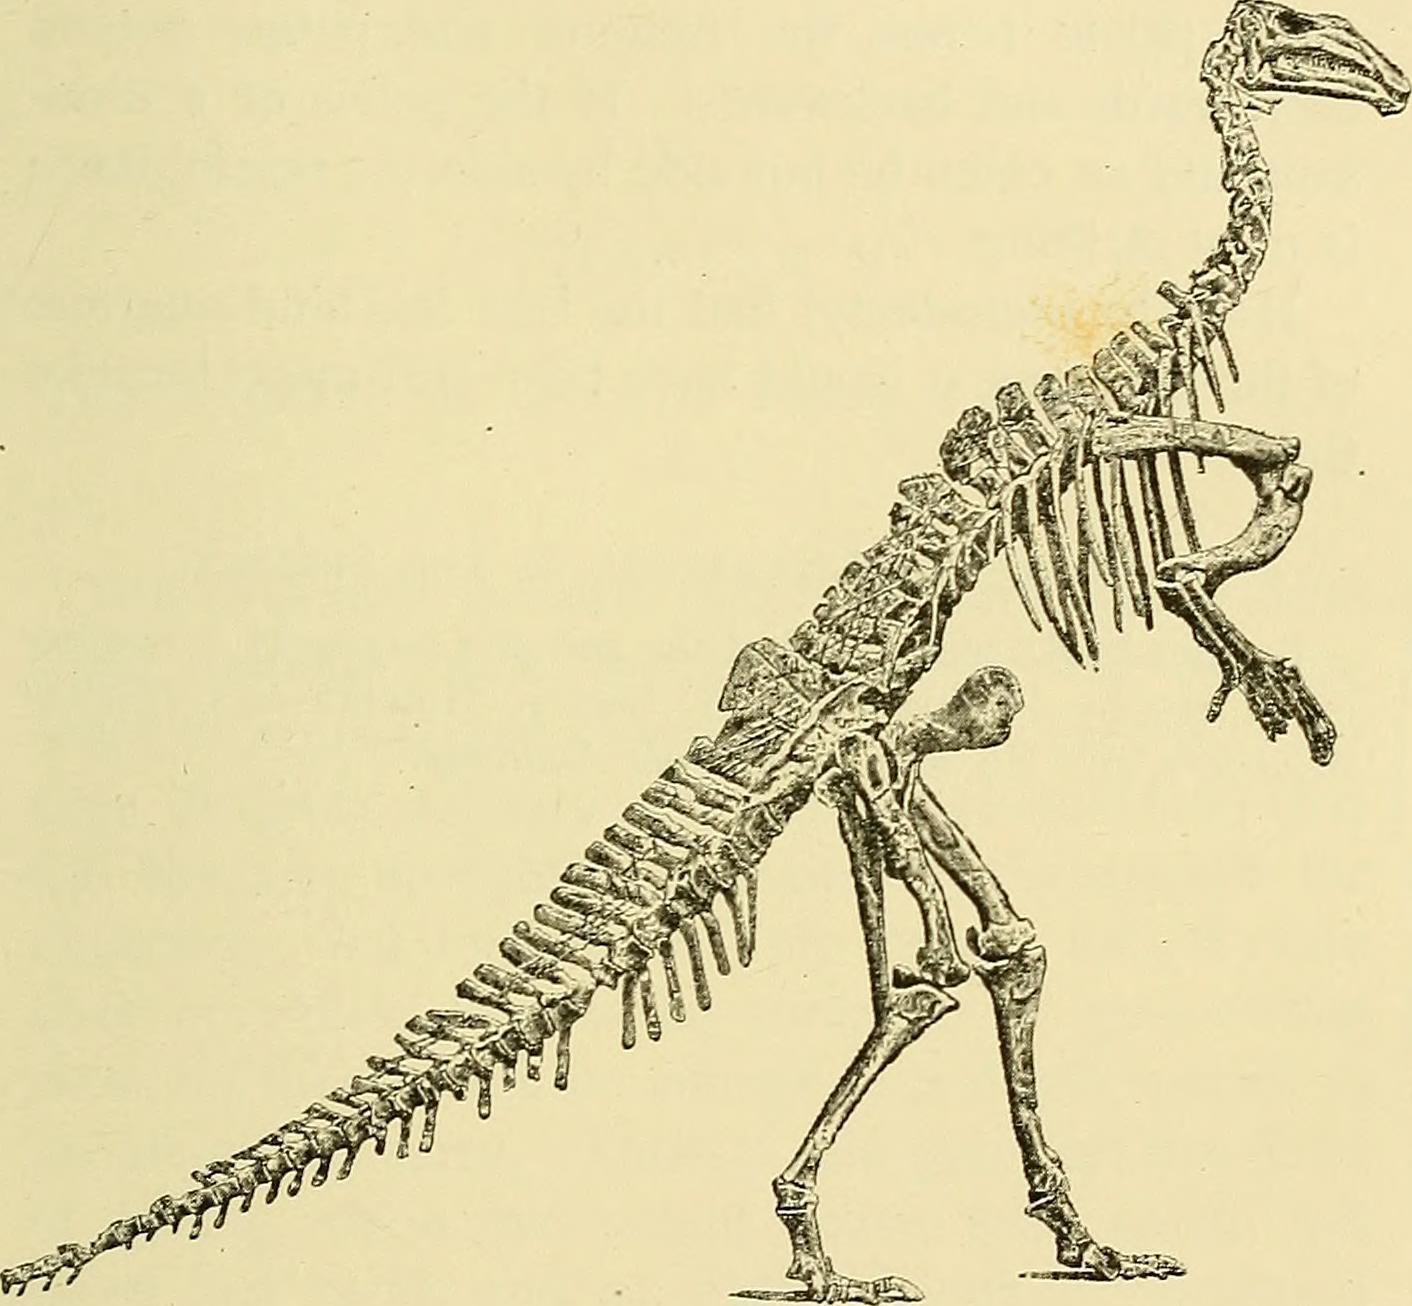 Image of Dollodon